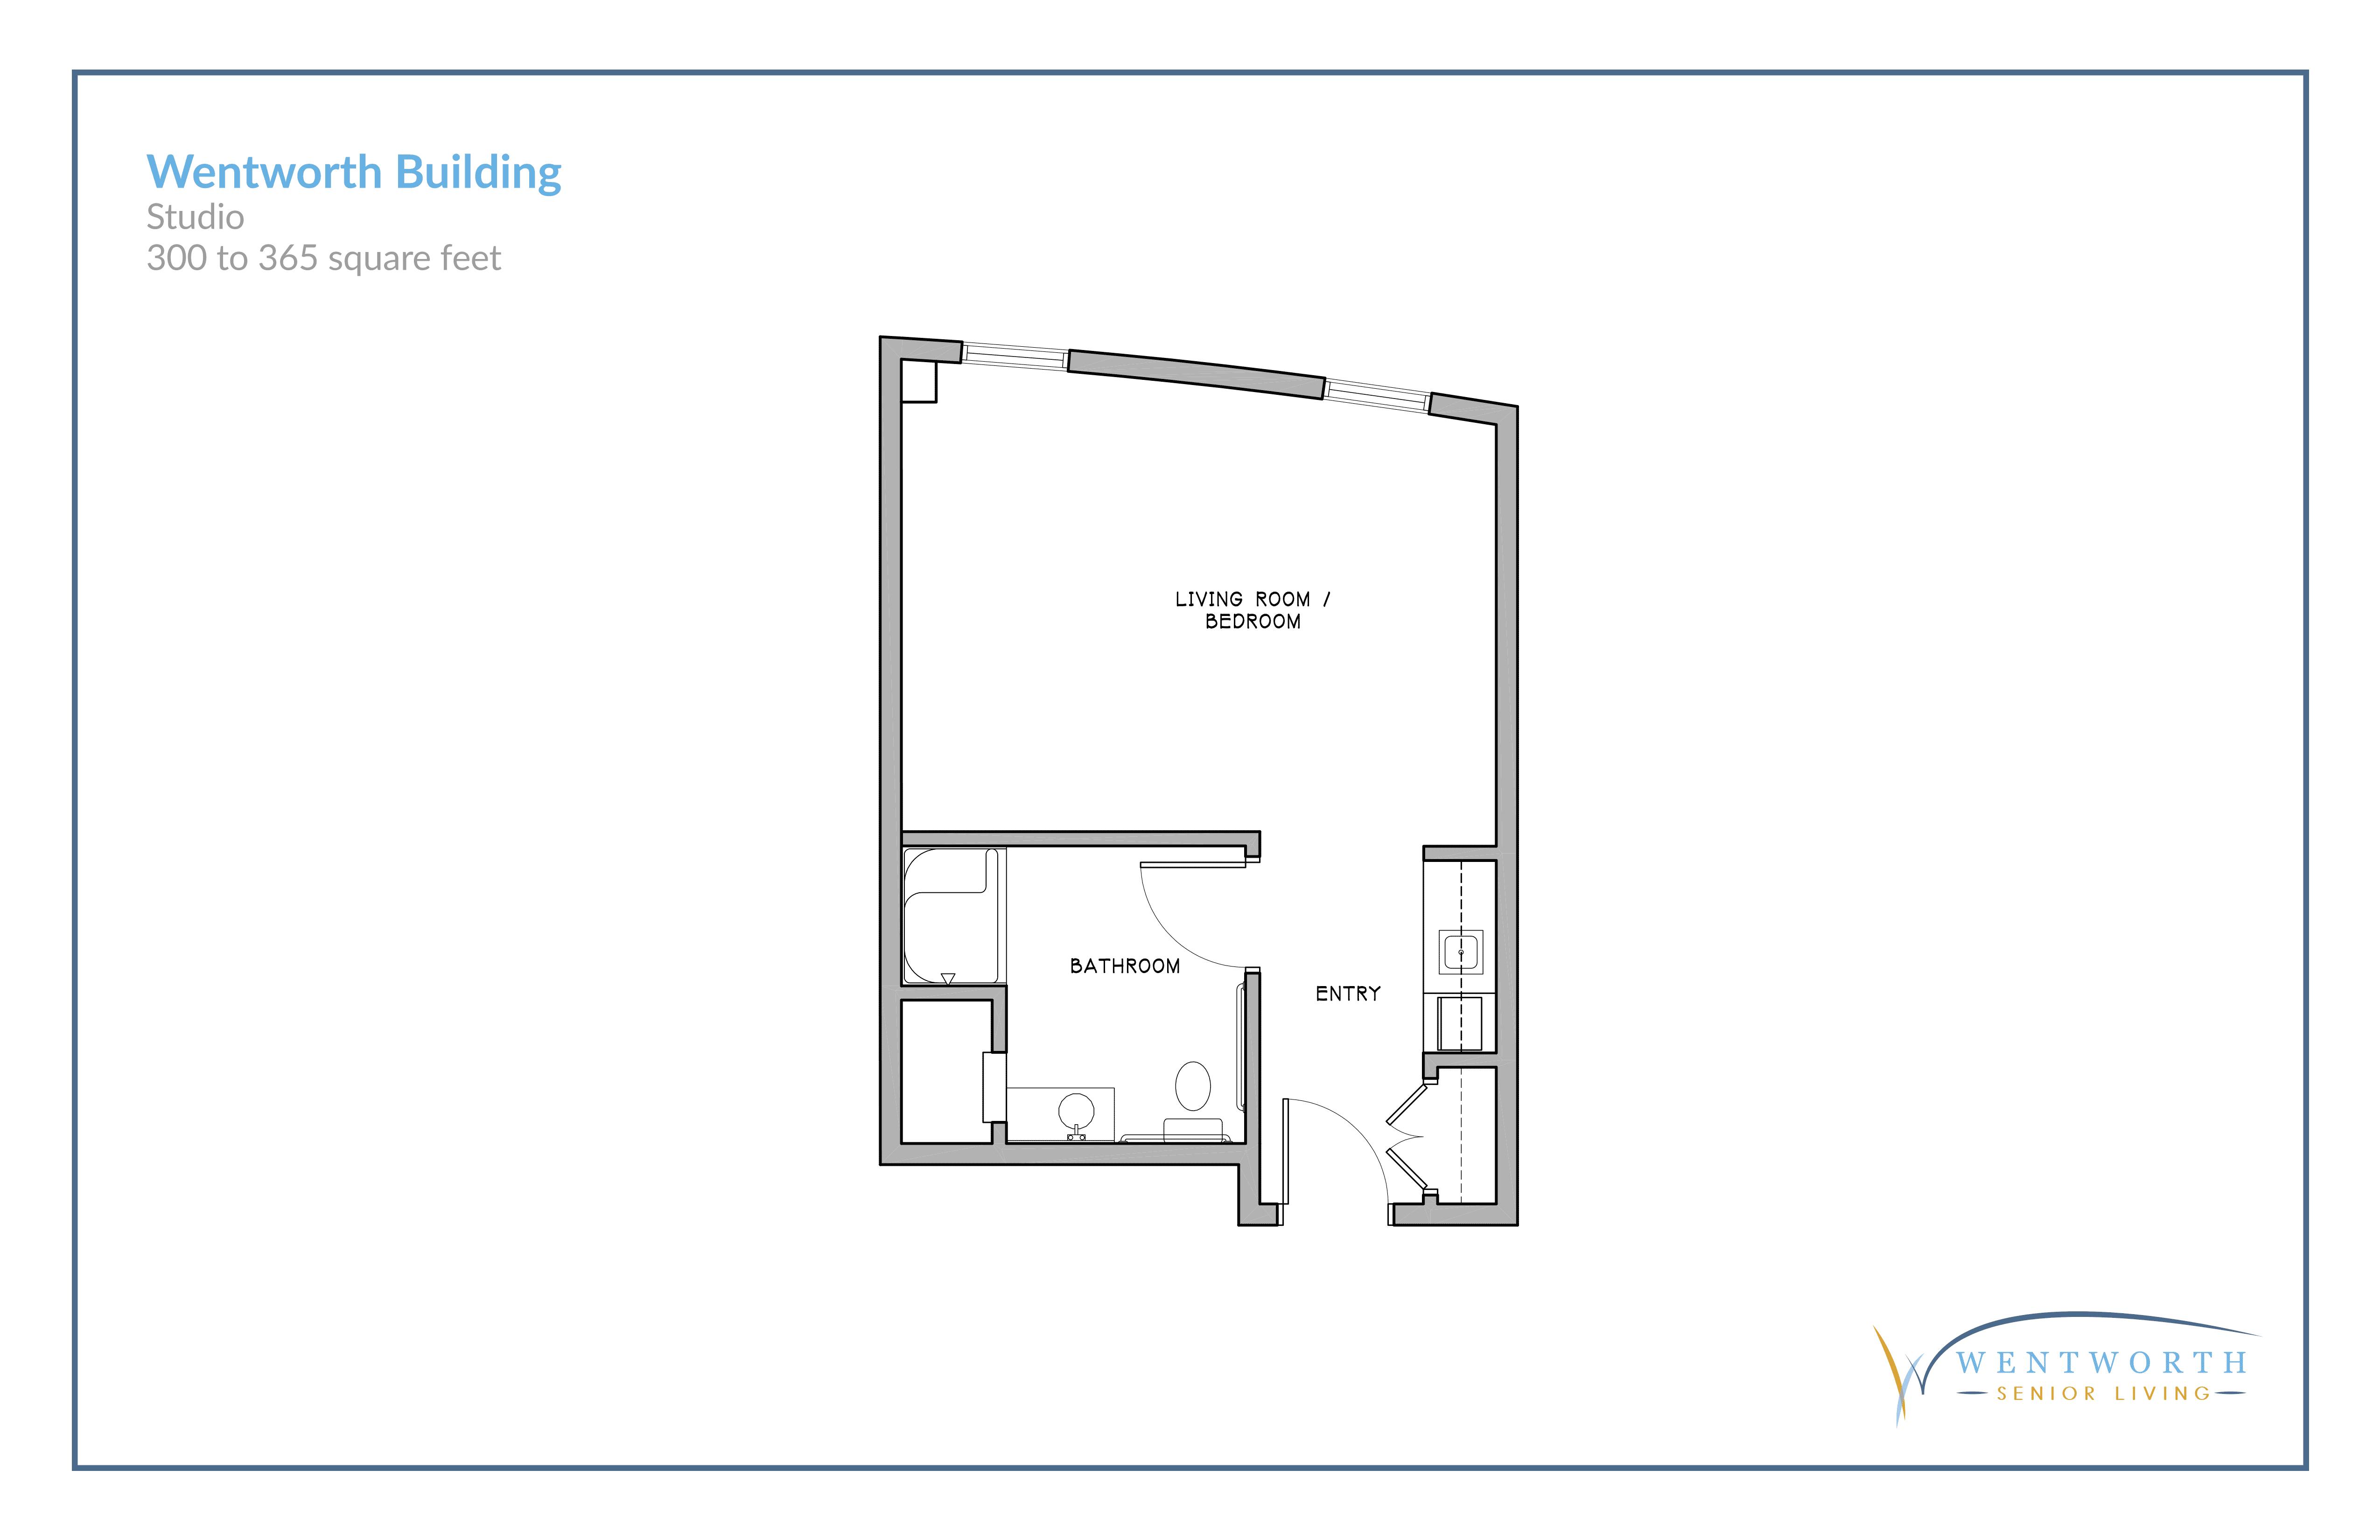 Floor plan for a studio unit.